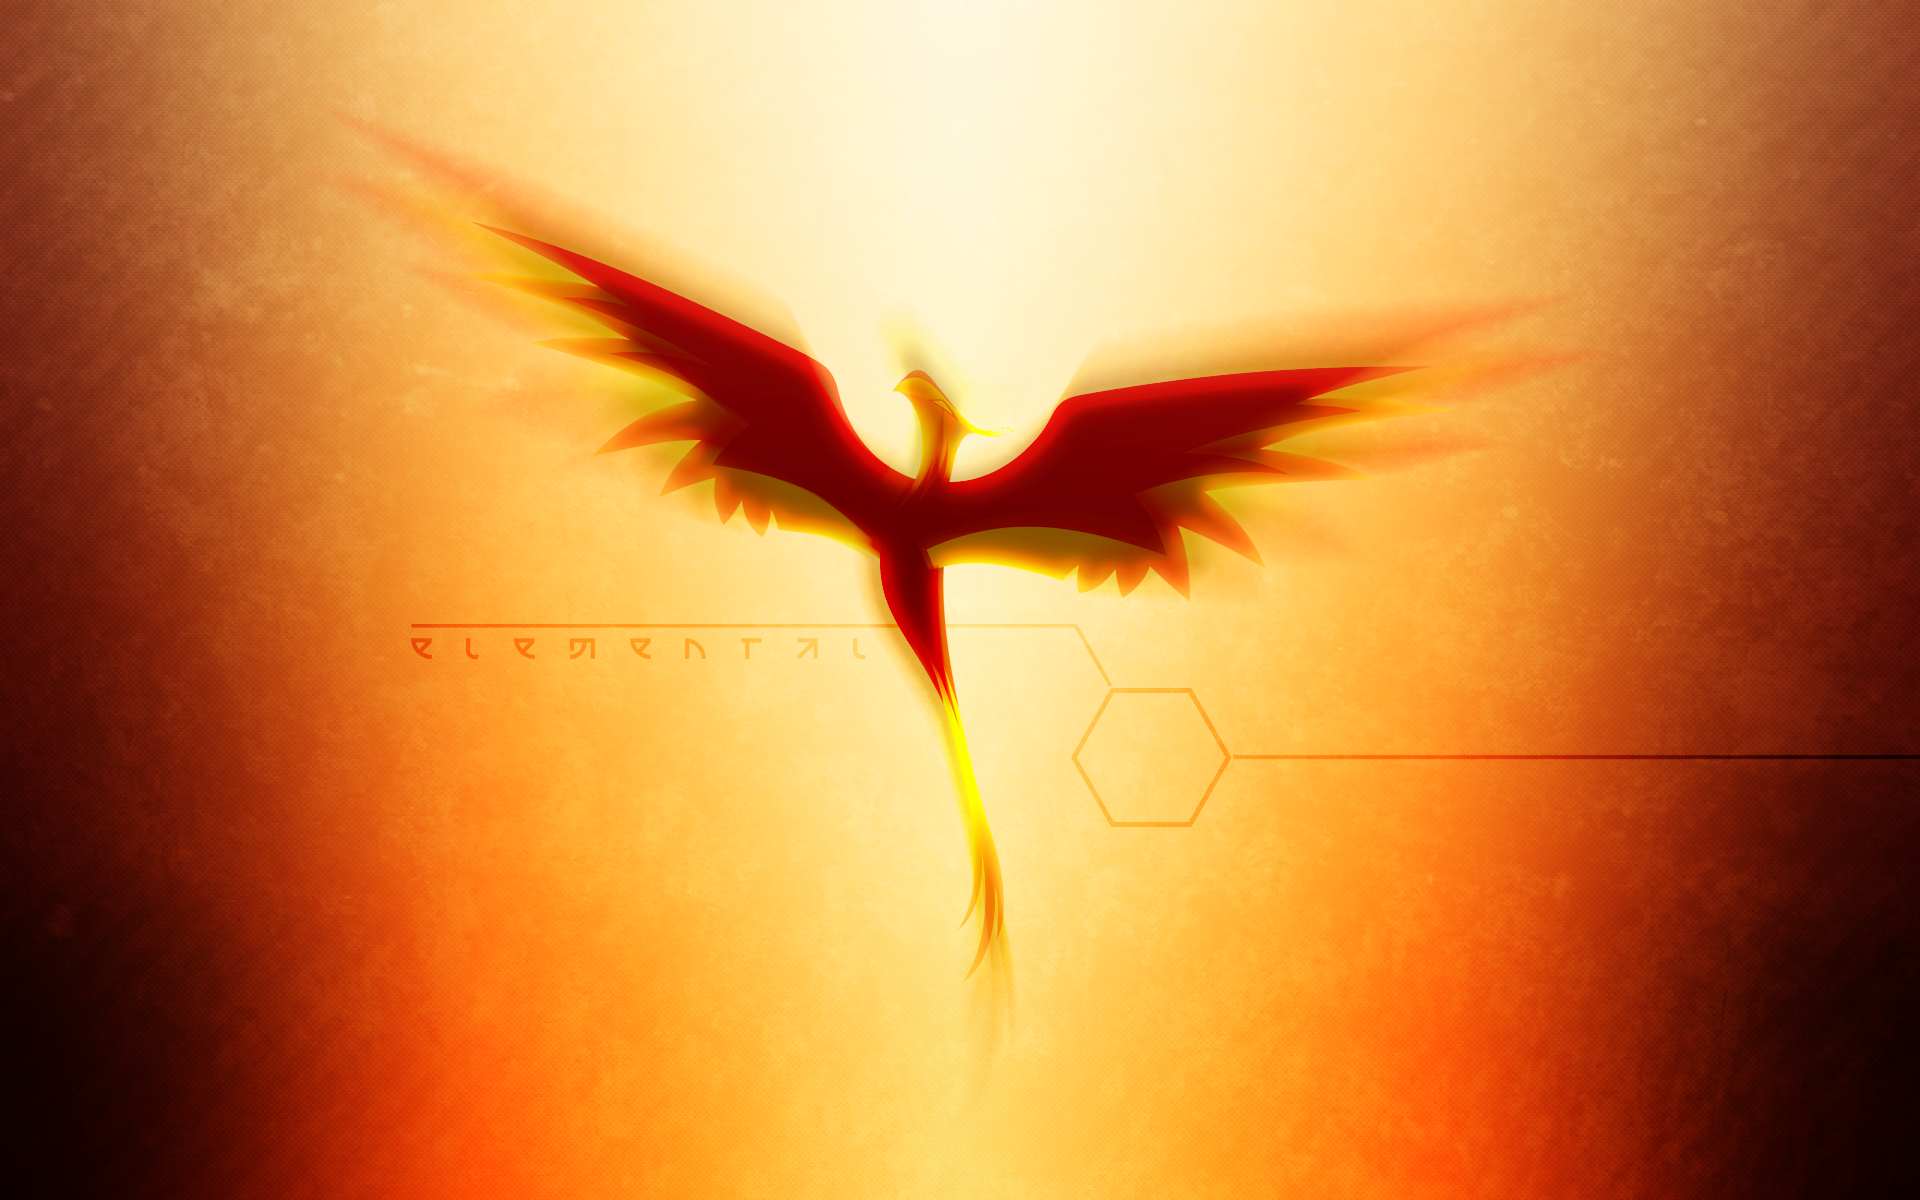 Elemental by Hawk9mm and Vexx3